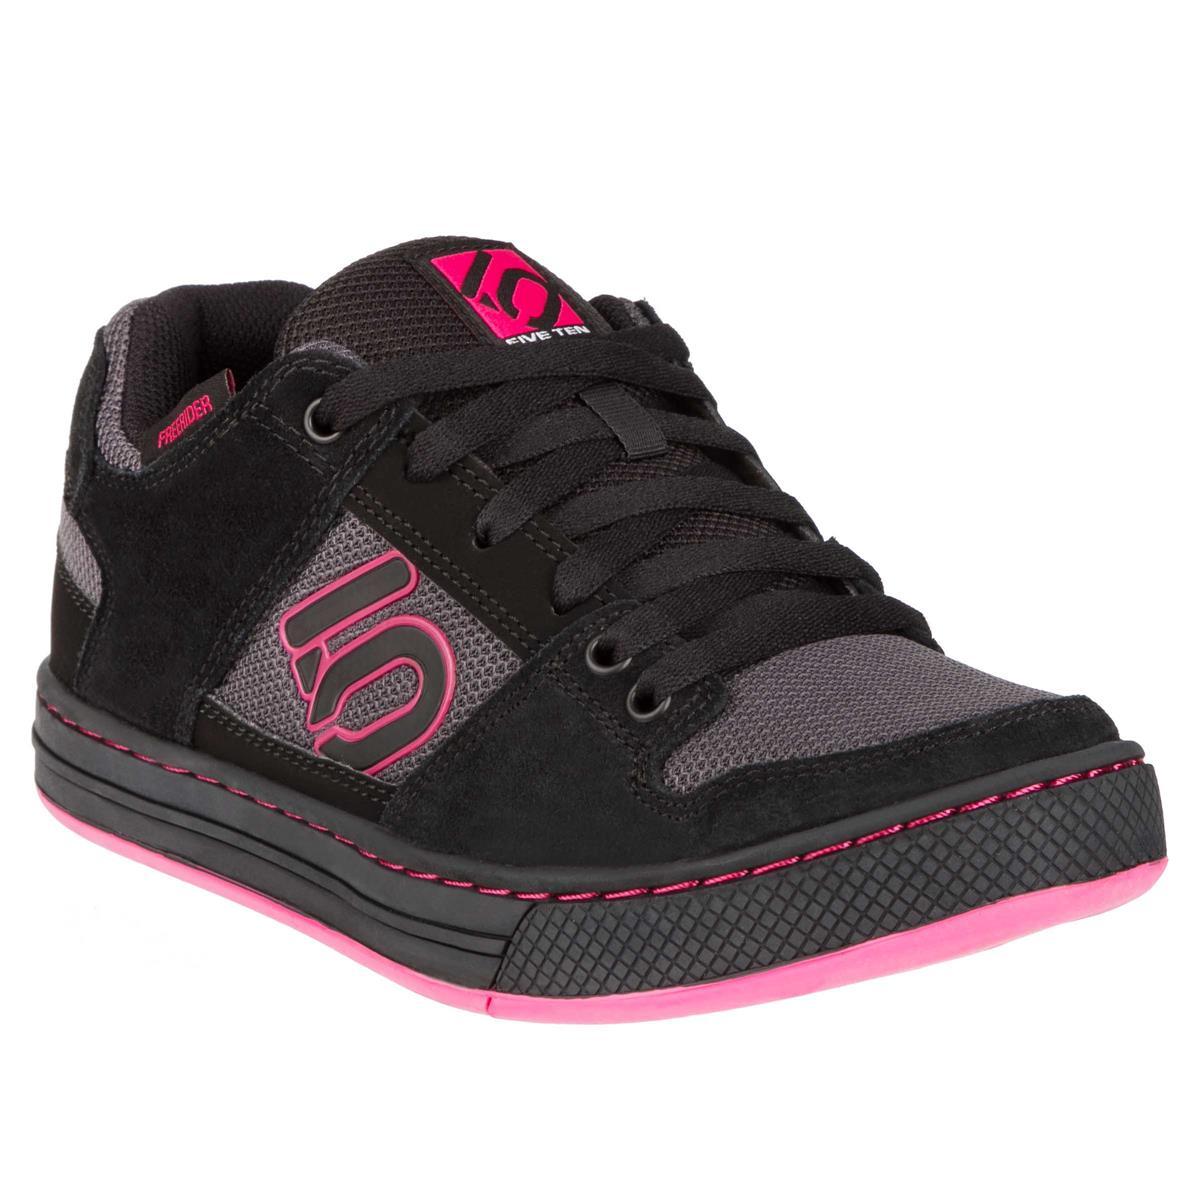 Five Ten Girls MTB-Schuhe Freerider Carbon/Core Black/Vivid Berry